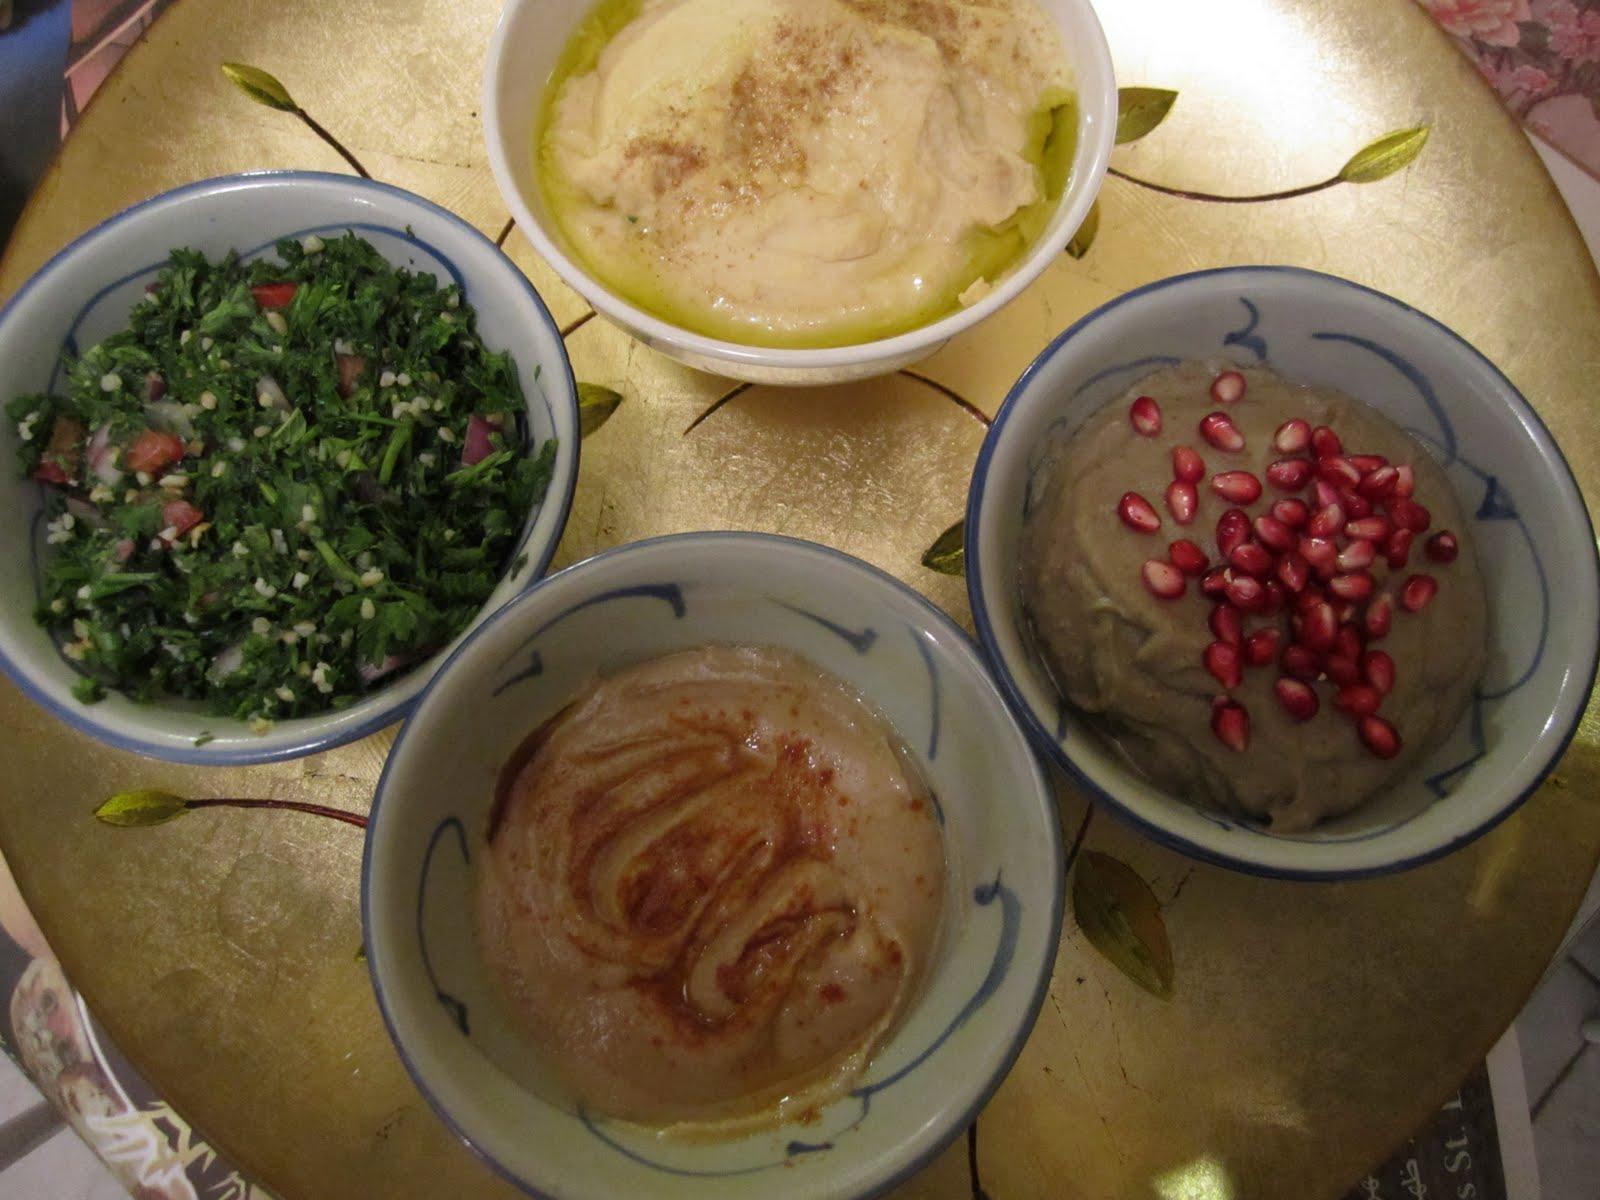 The egyptian kitchen mezze saladsappetizers sunday september 26 2010 forumfinder Images